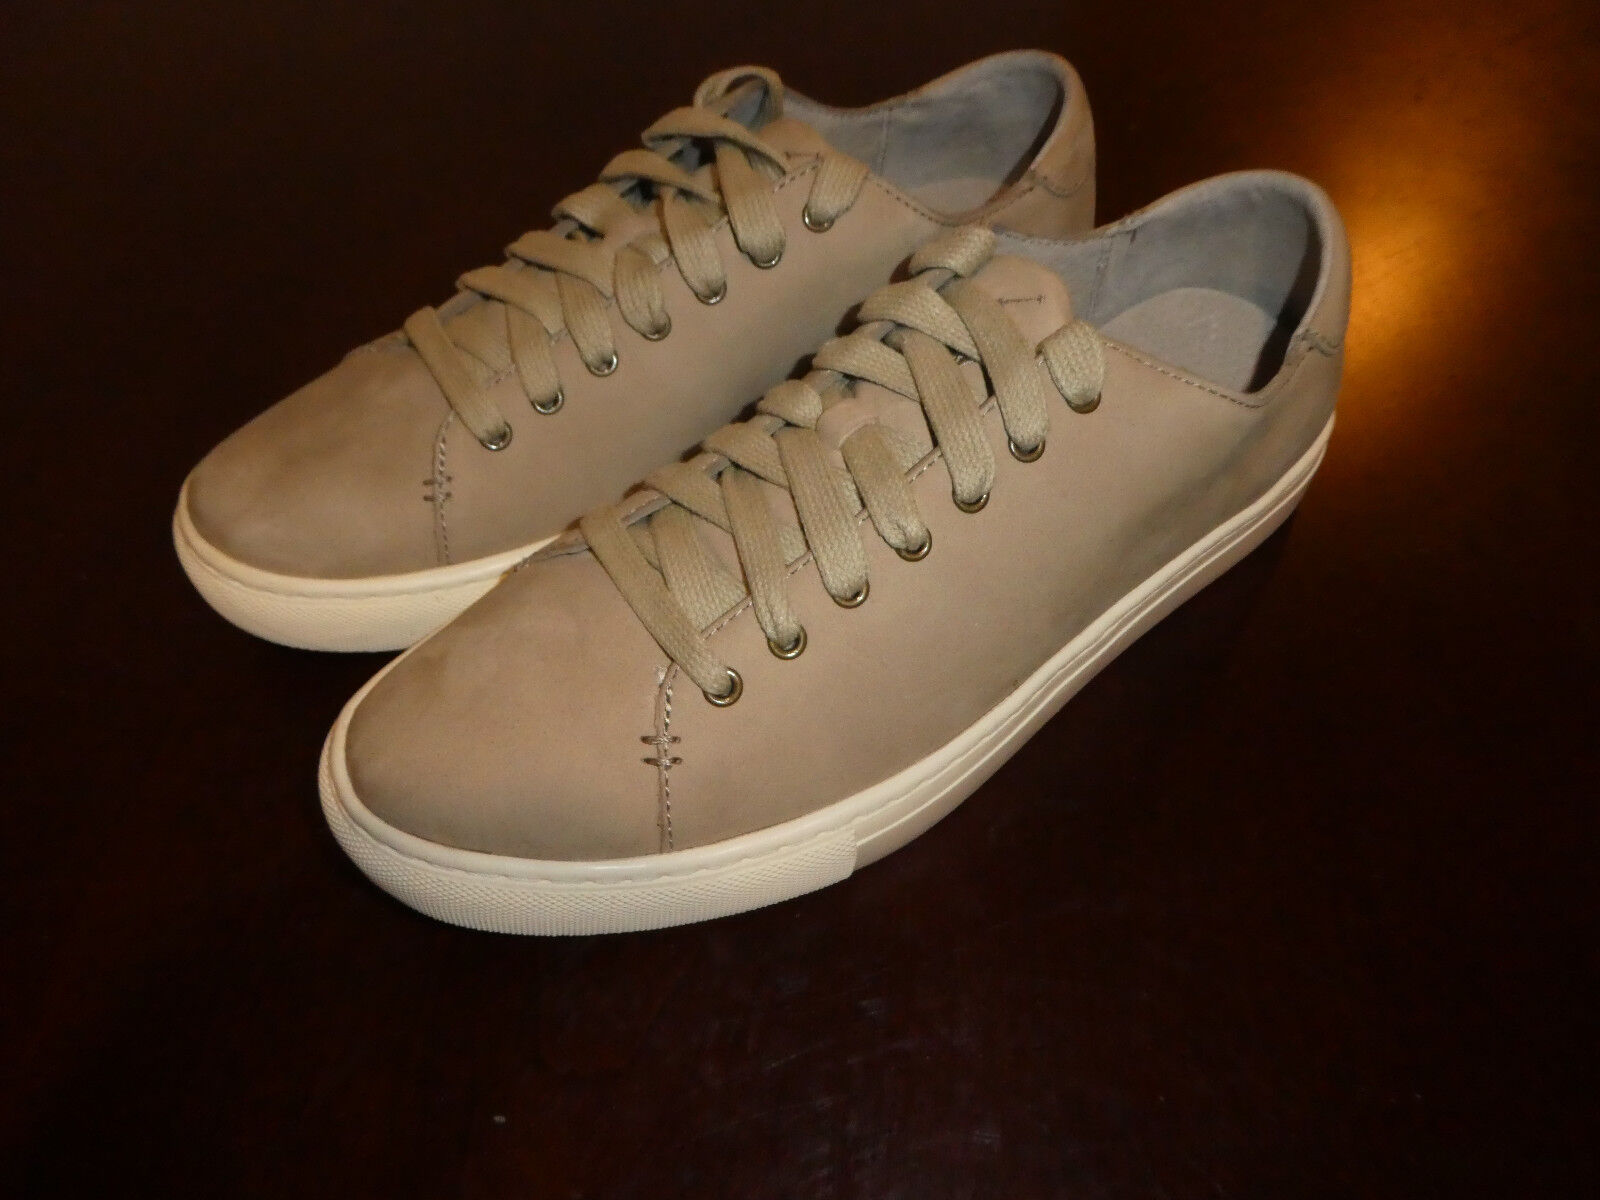 Polo Ralph Lauren Jermain Dark Buck mens shoes new size 11.5